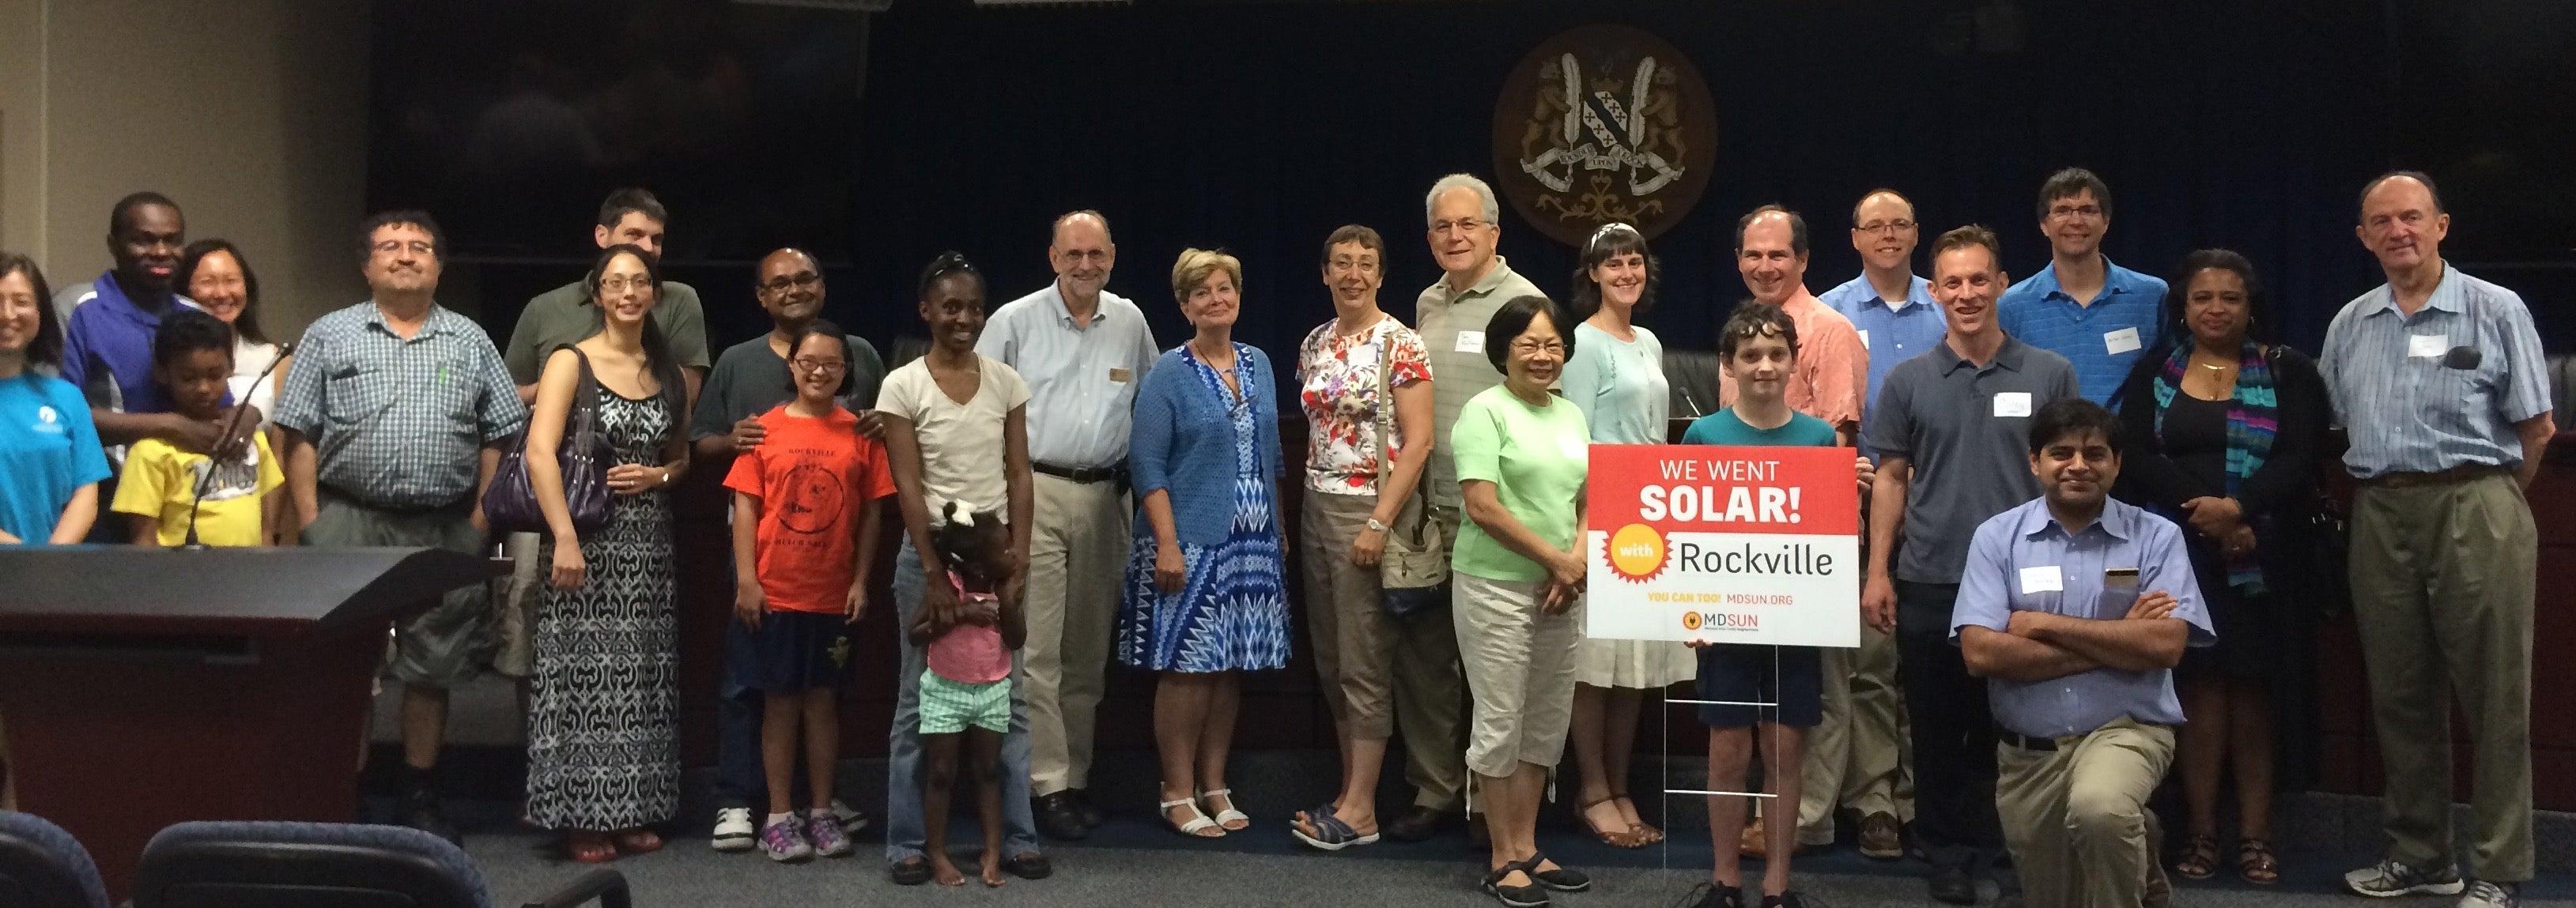 Rockville Solar Co-op celebration